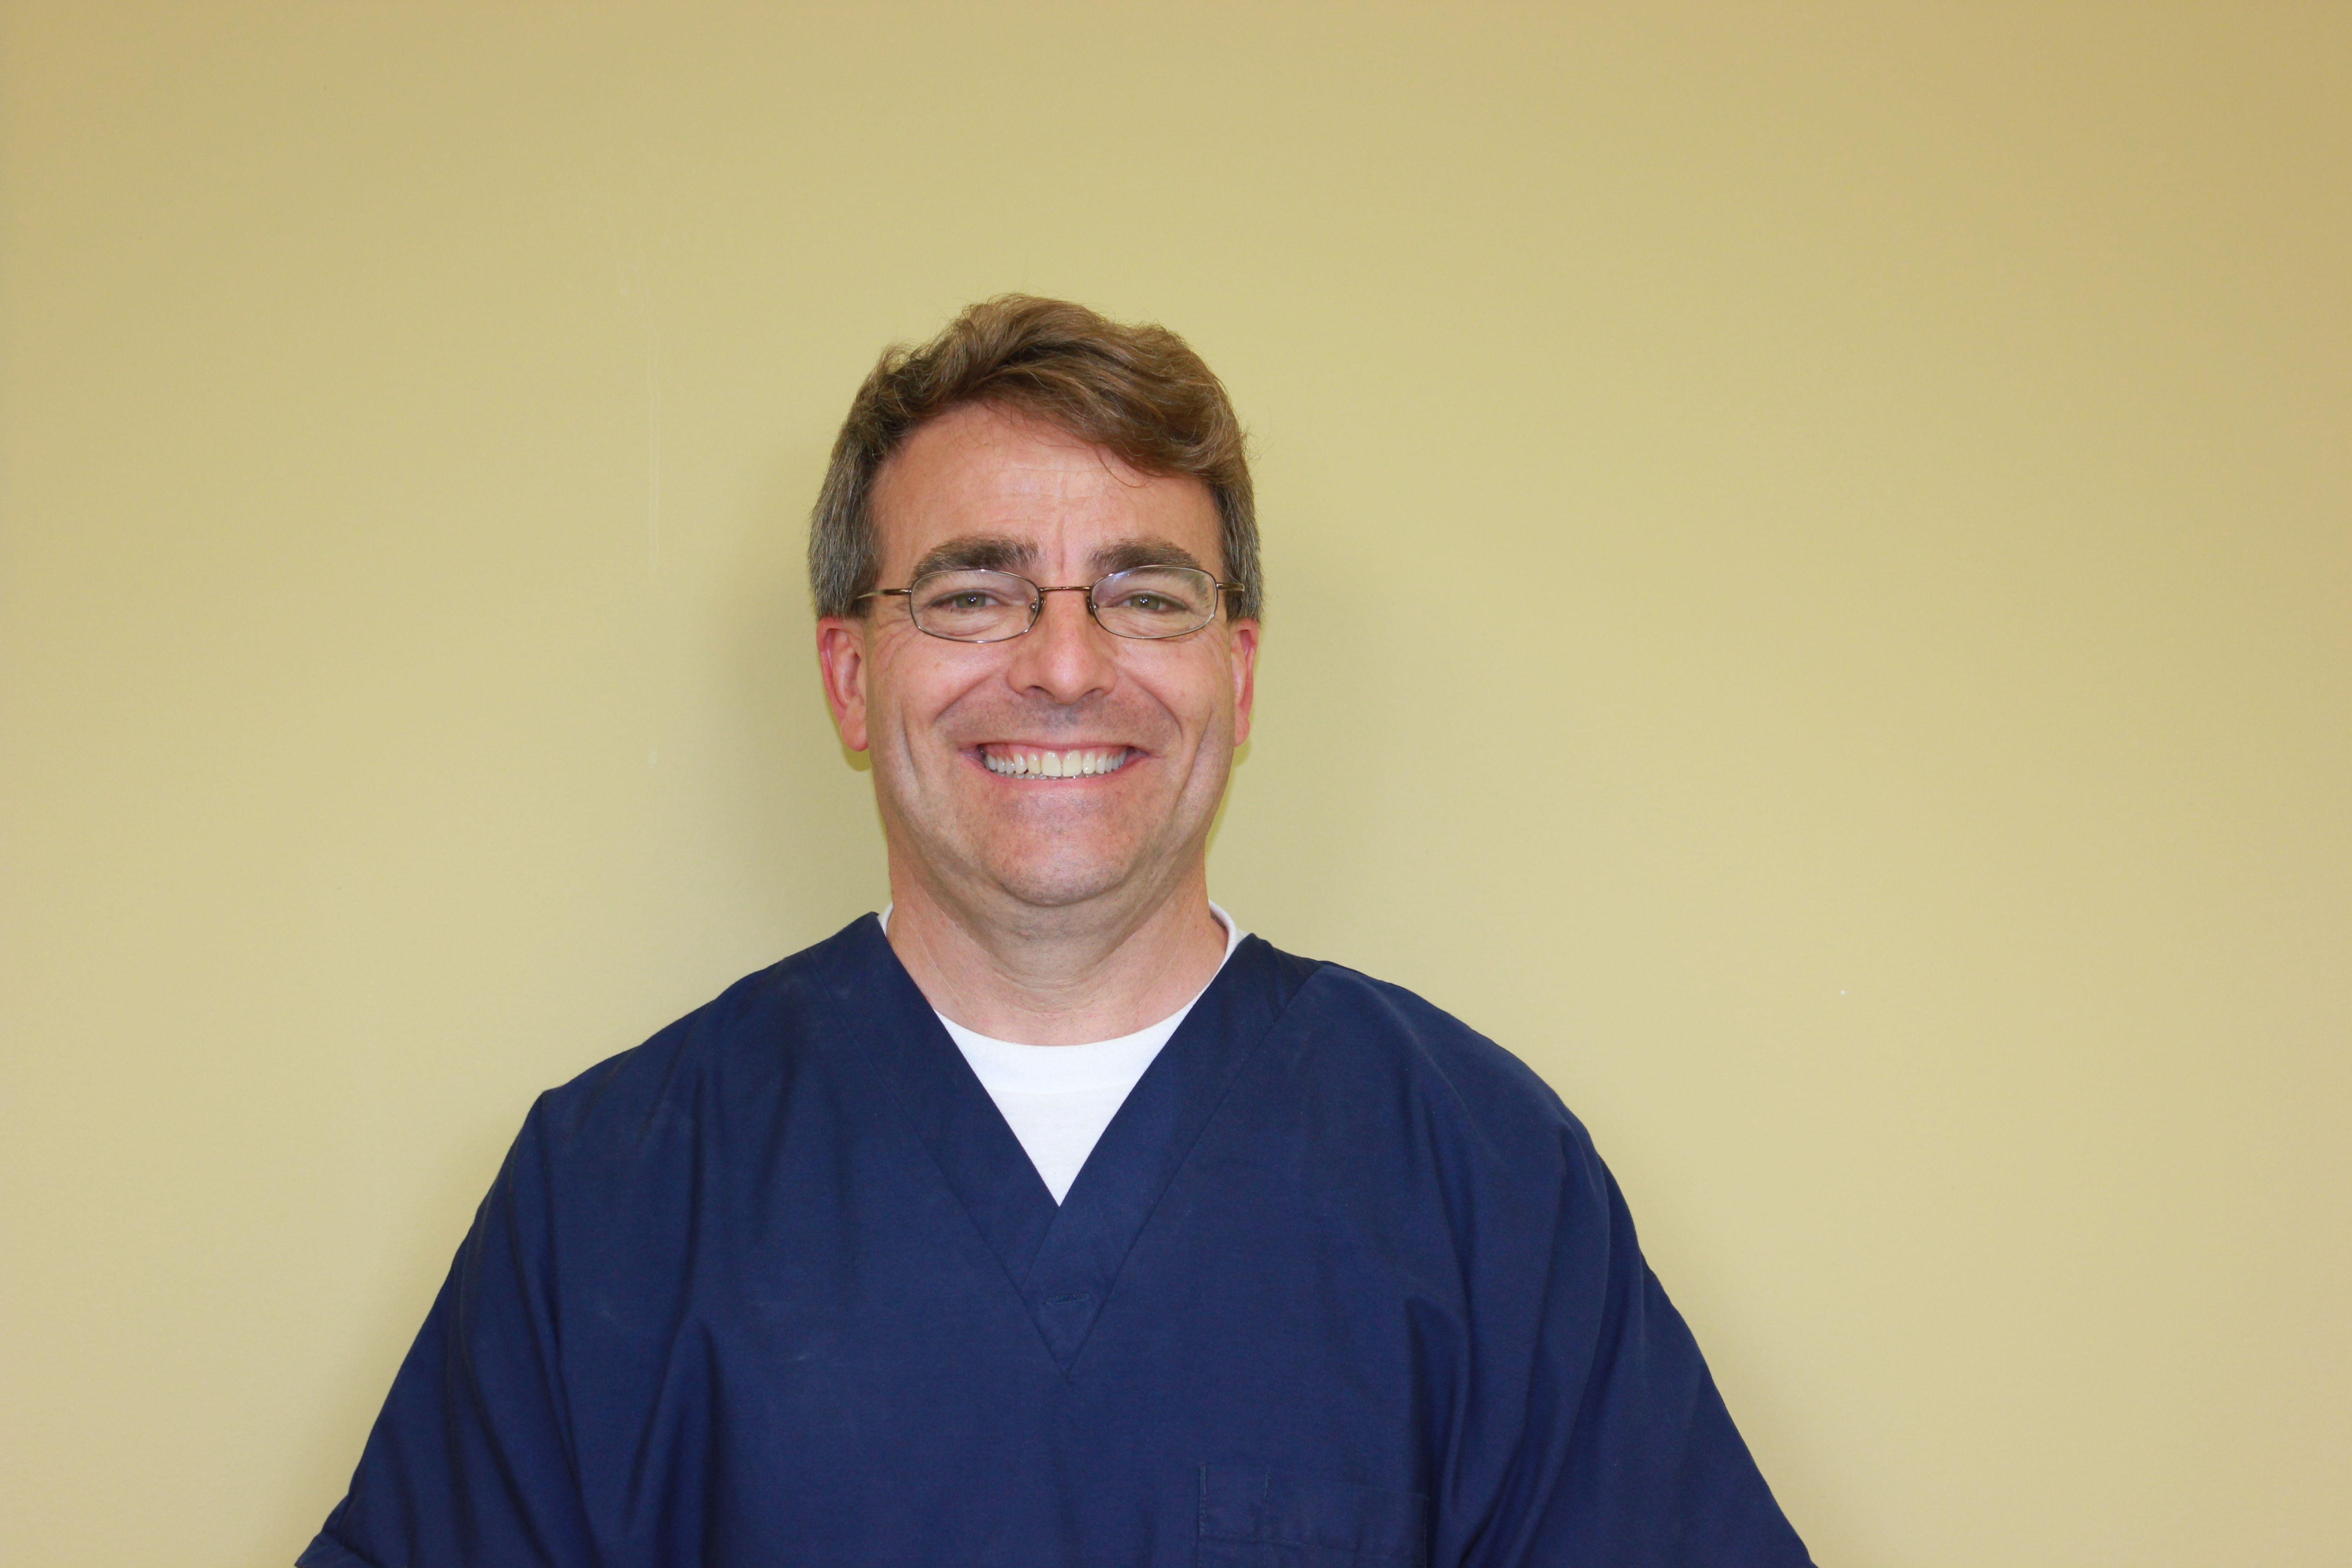 Dr. Steven C Fuller DDS Des Moines, IA  https://www.facebook.com/pages/Fuller-Associates-Family-Dentistry/358571380923860